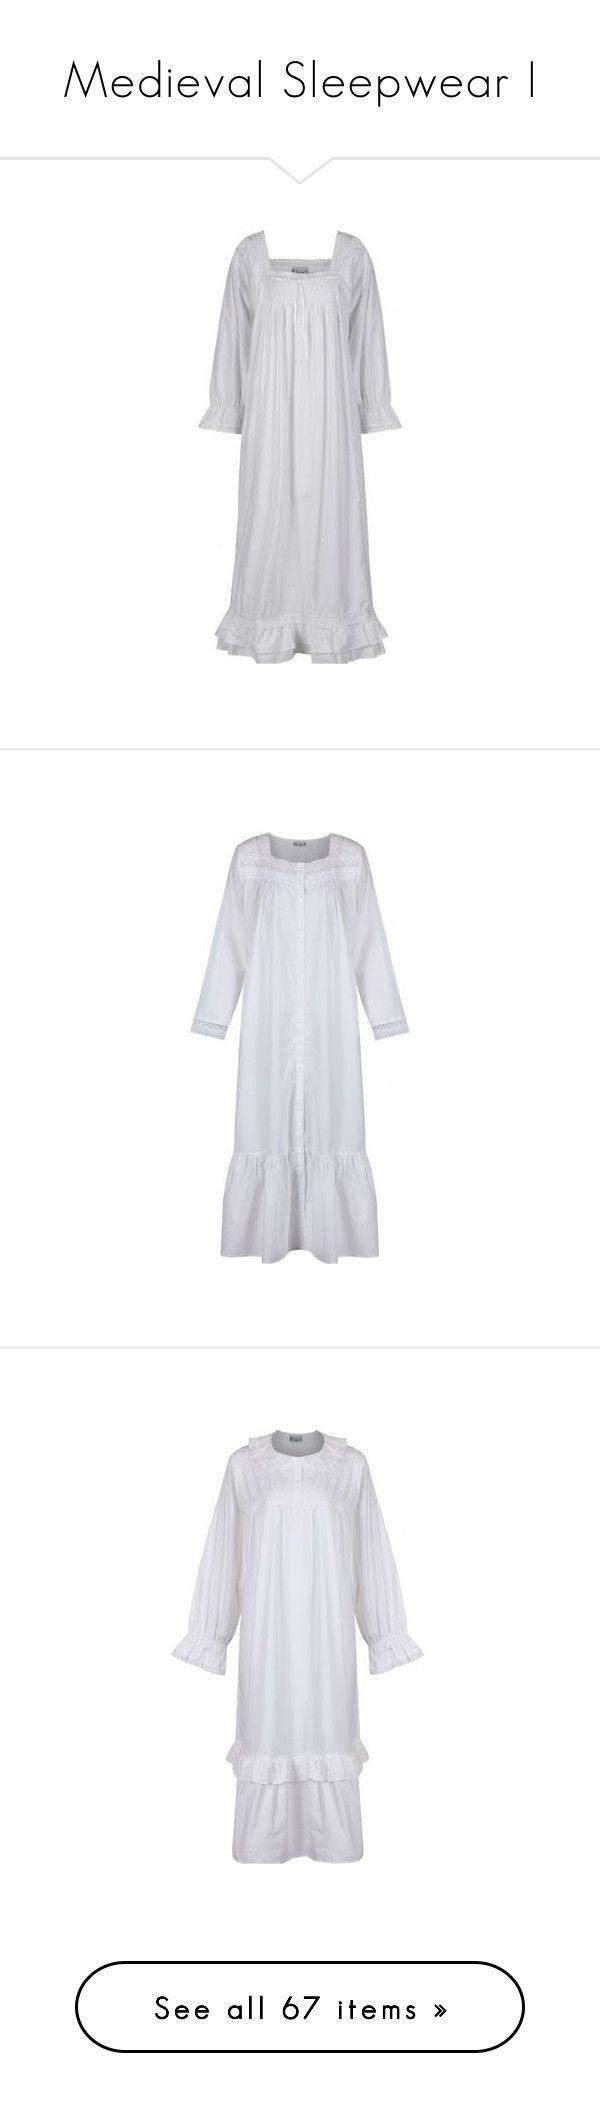 """Medieval Sleepwear I"" by savagedamsel ❤ liked on Polyvore featuring intimates, sleepwear, nightgowns, dresses, gowns, lingerie, cotton sleep wear, long sleeve cotton nightgown, long nightdress and cotton sleepwear"